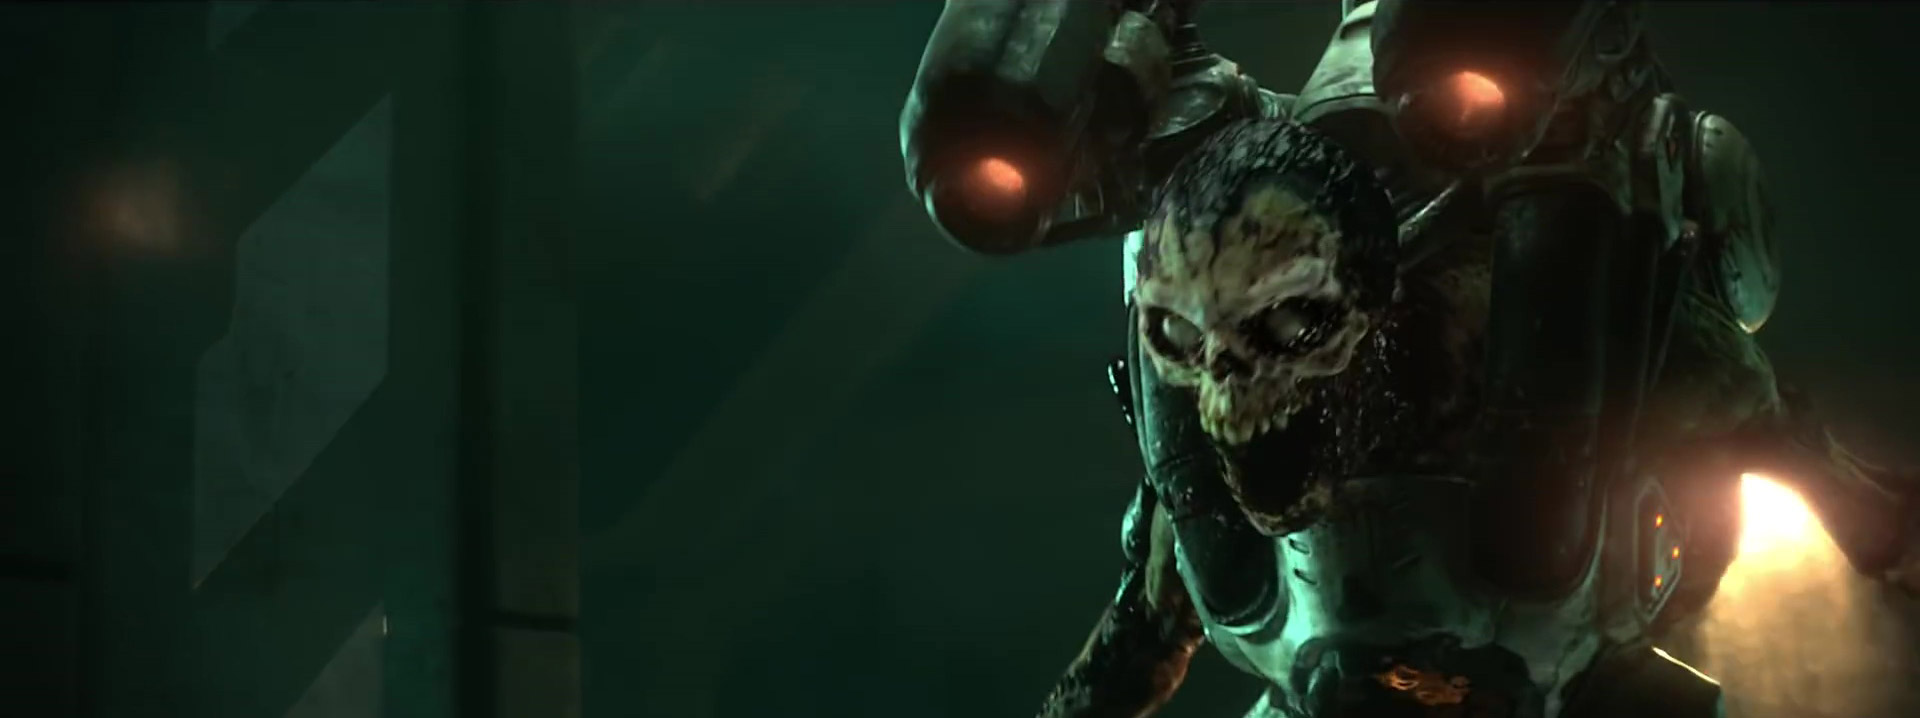 doom-2016-video-game-trailer-2